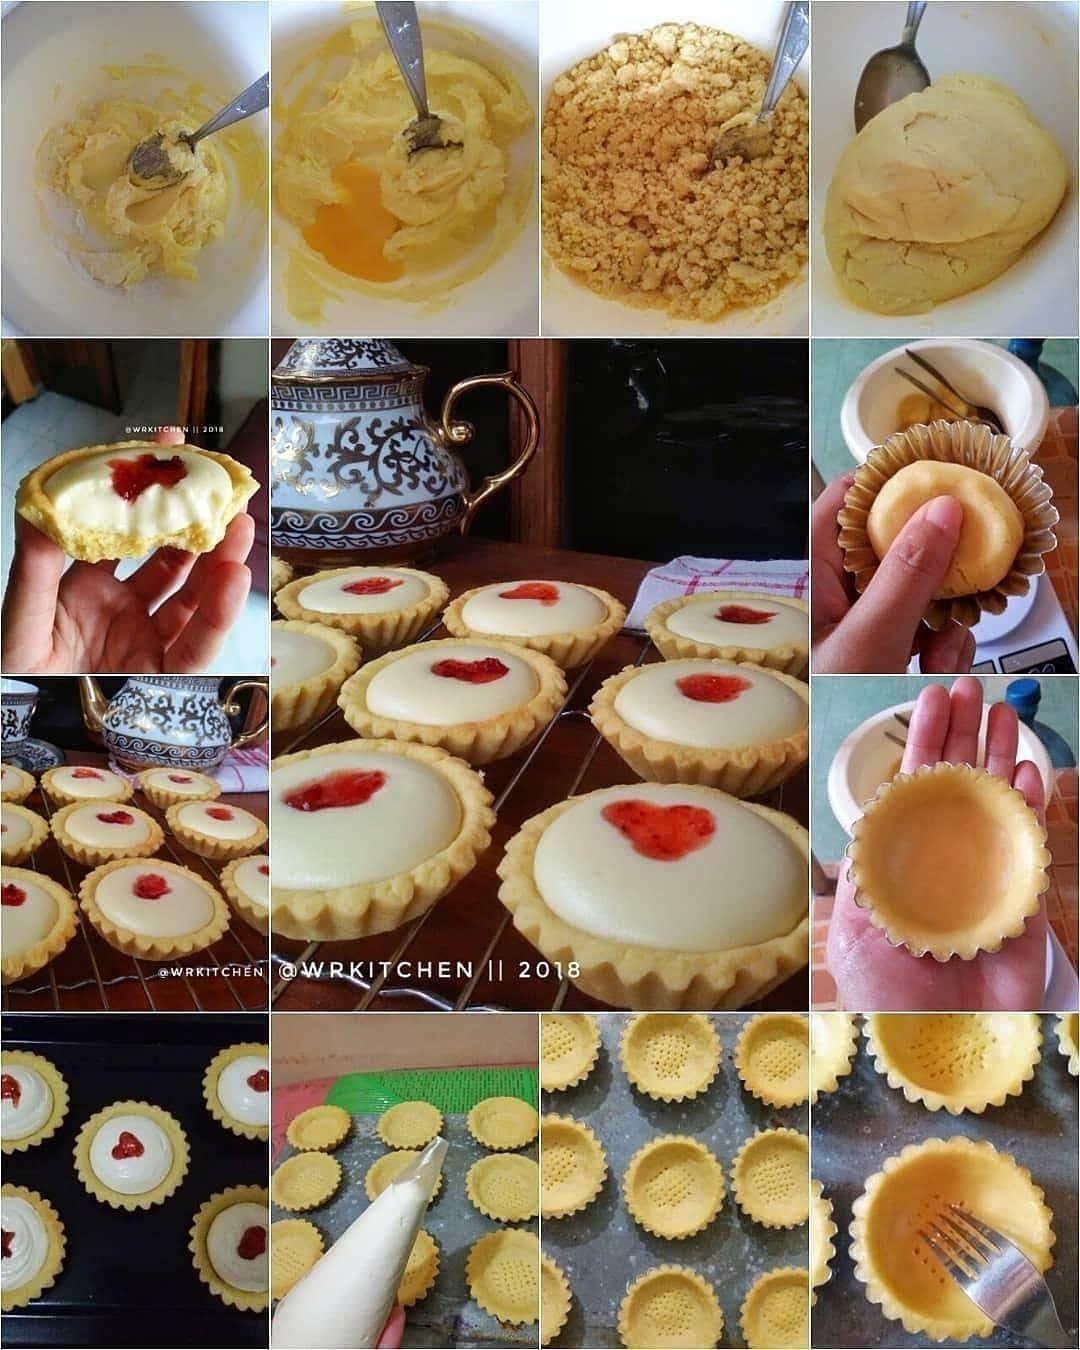 Aneka Resep Koki Nusantara On Instagram Jangan Lupa Tap Love Strawberry Cheese Tart By Wr Japanese Cheese Tart Bakery Cakes Cheese Tarts